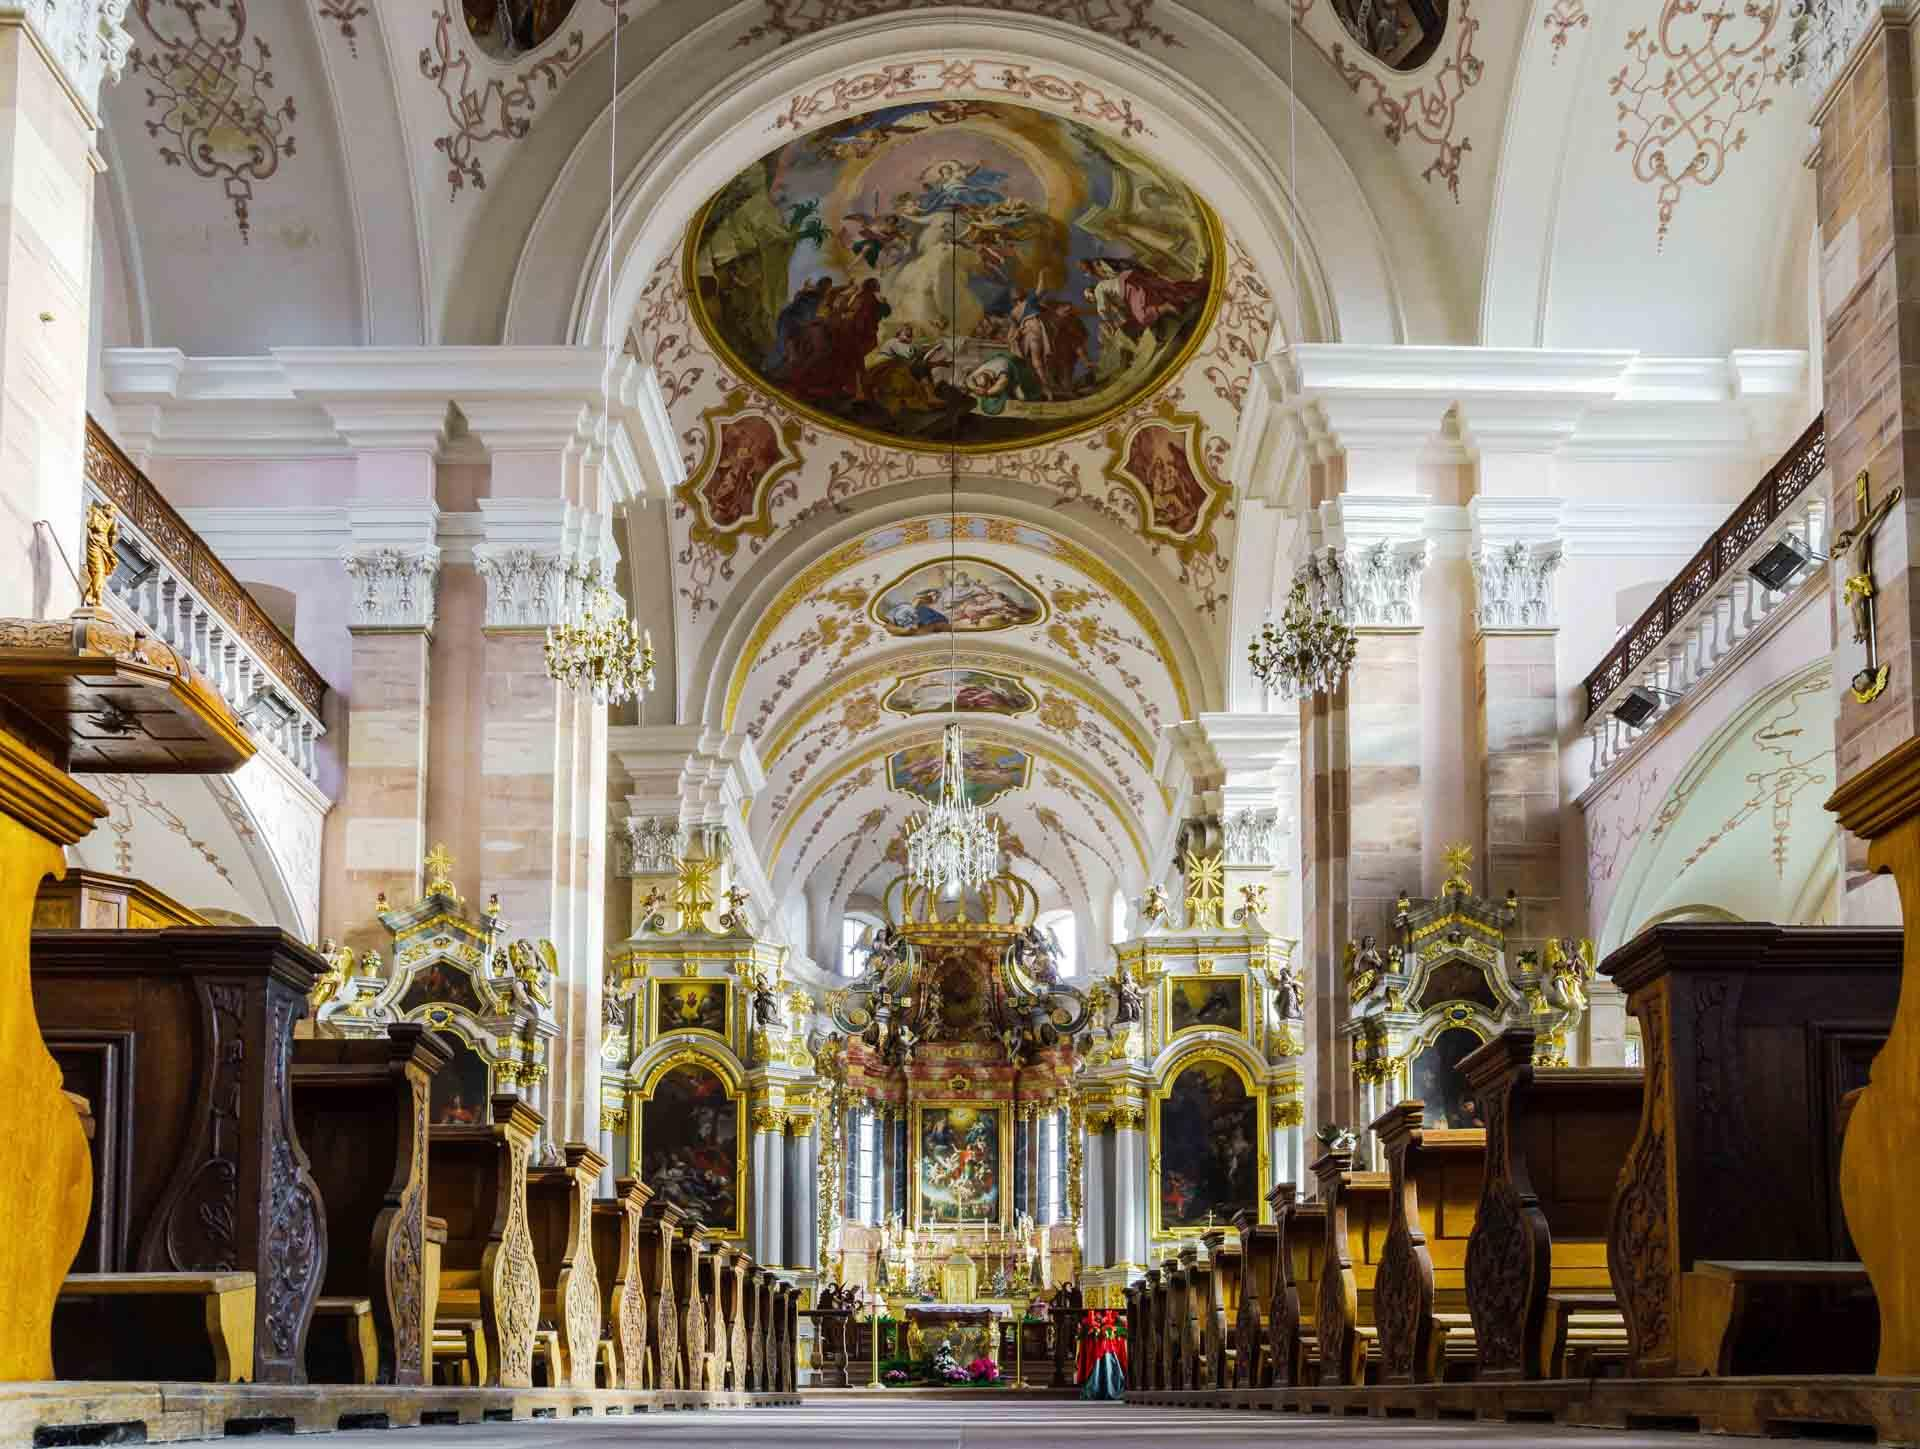 L'abbaye d'Ebersmunster et son intérieur baroque flamboyant © Alexander - adobestock